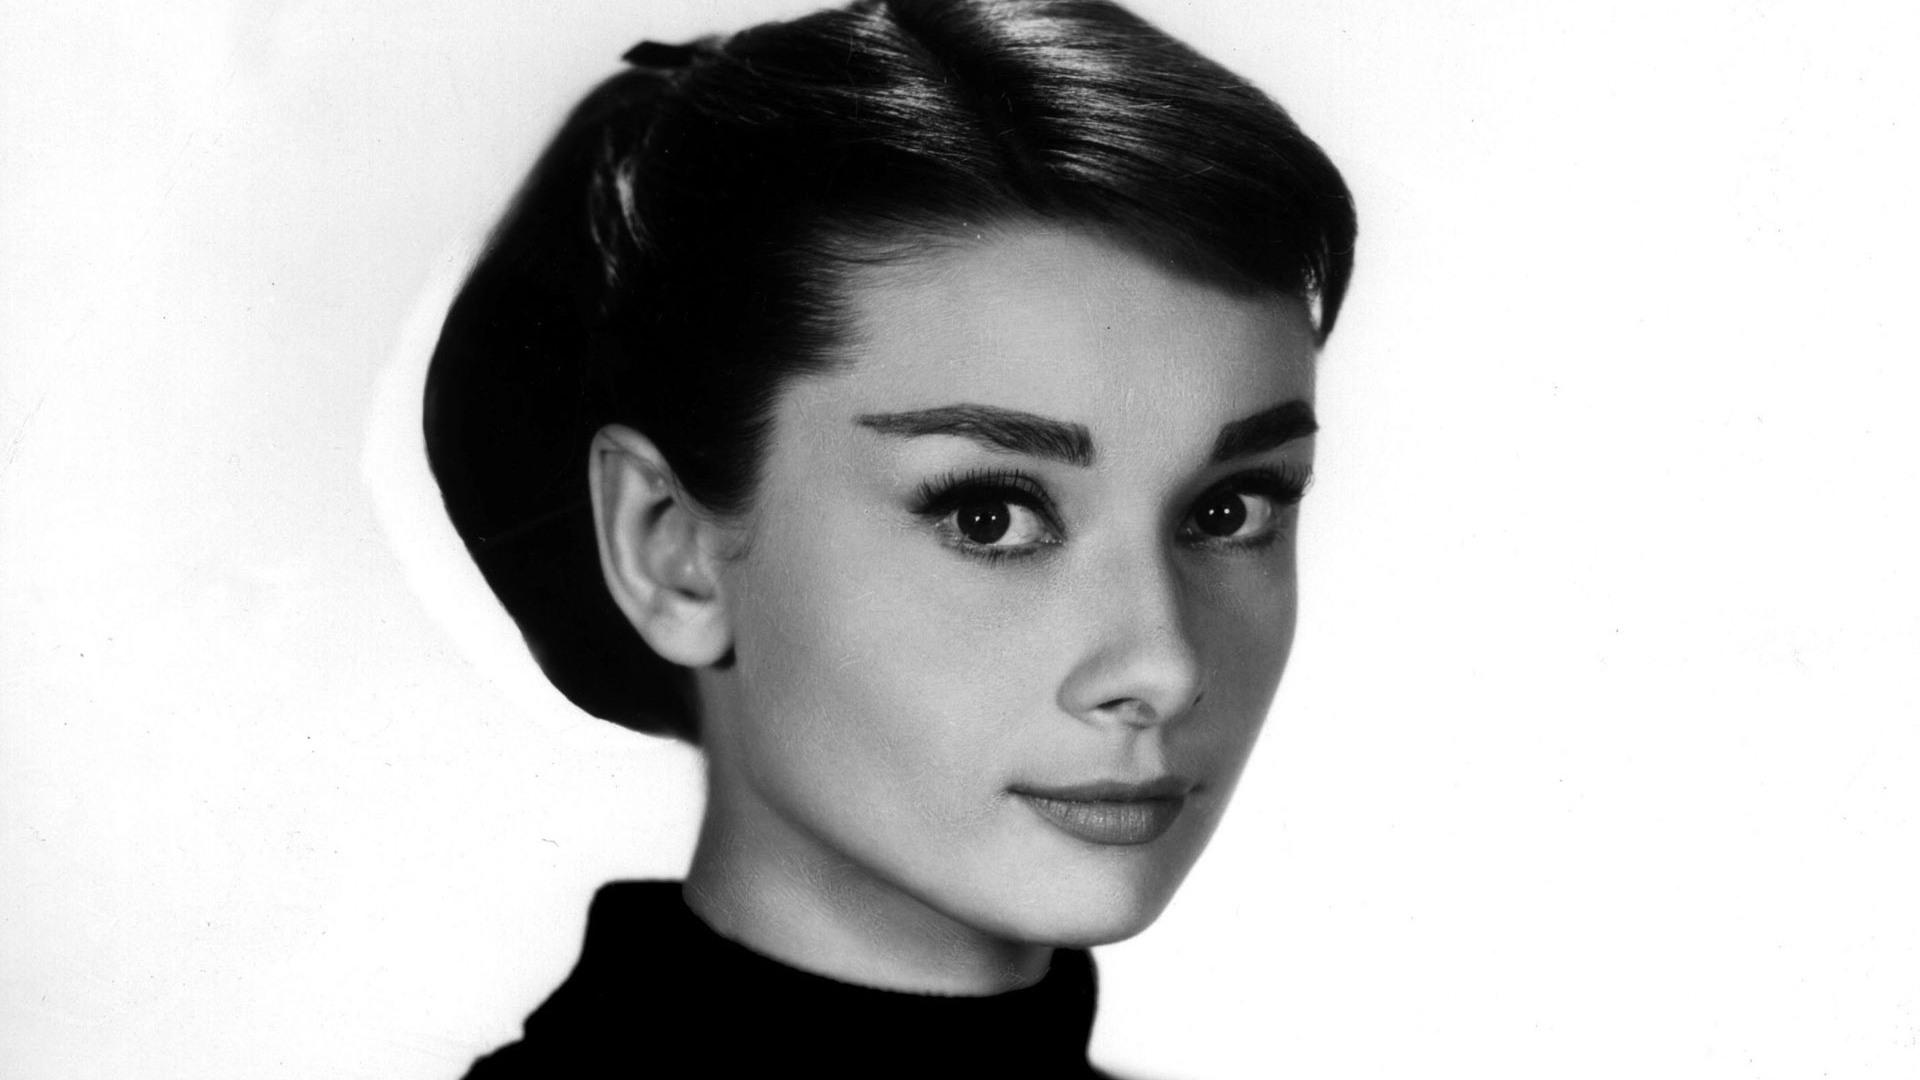 Audrey Hepburn HD Wallpaper 7604   HD Desktop Wallpaper HD 1920x1080